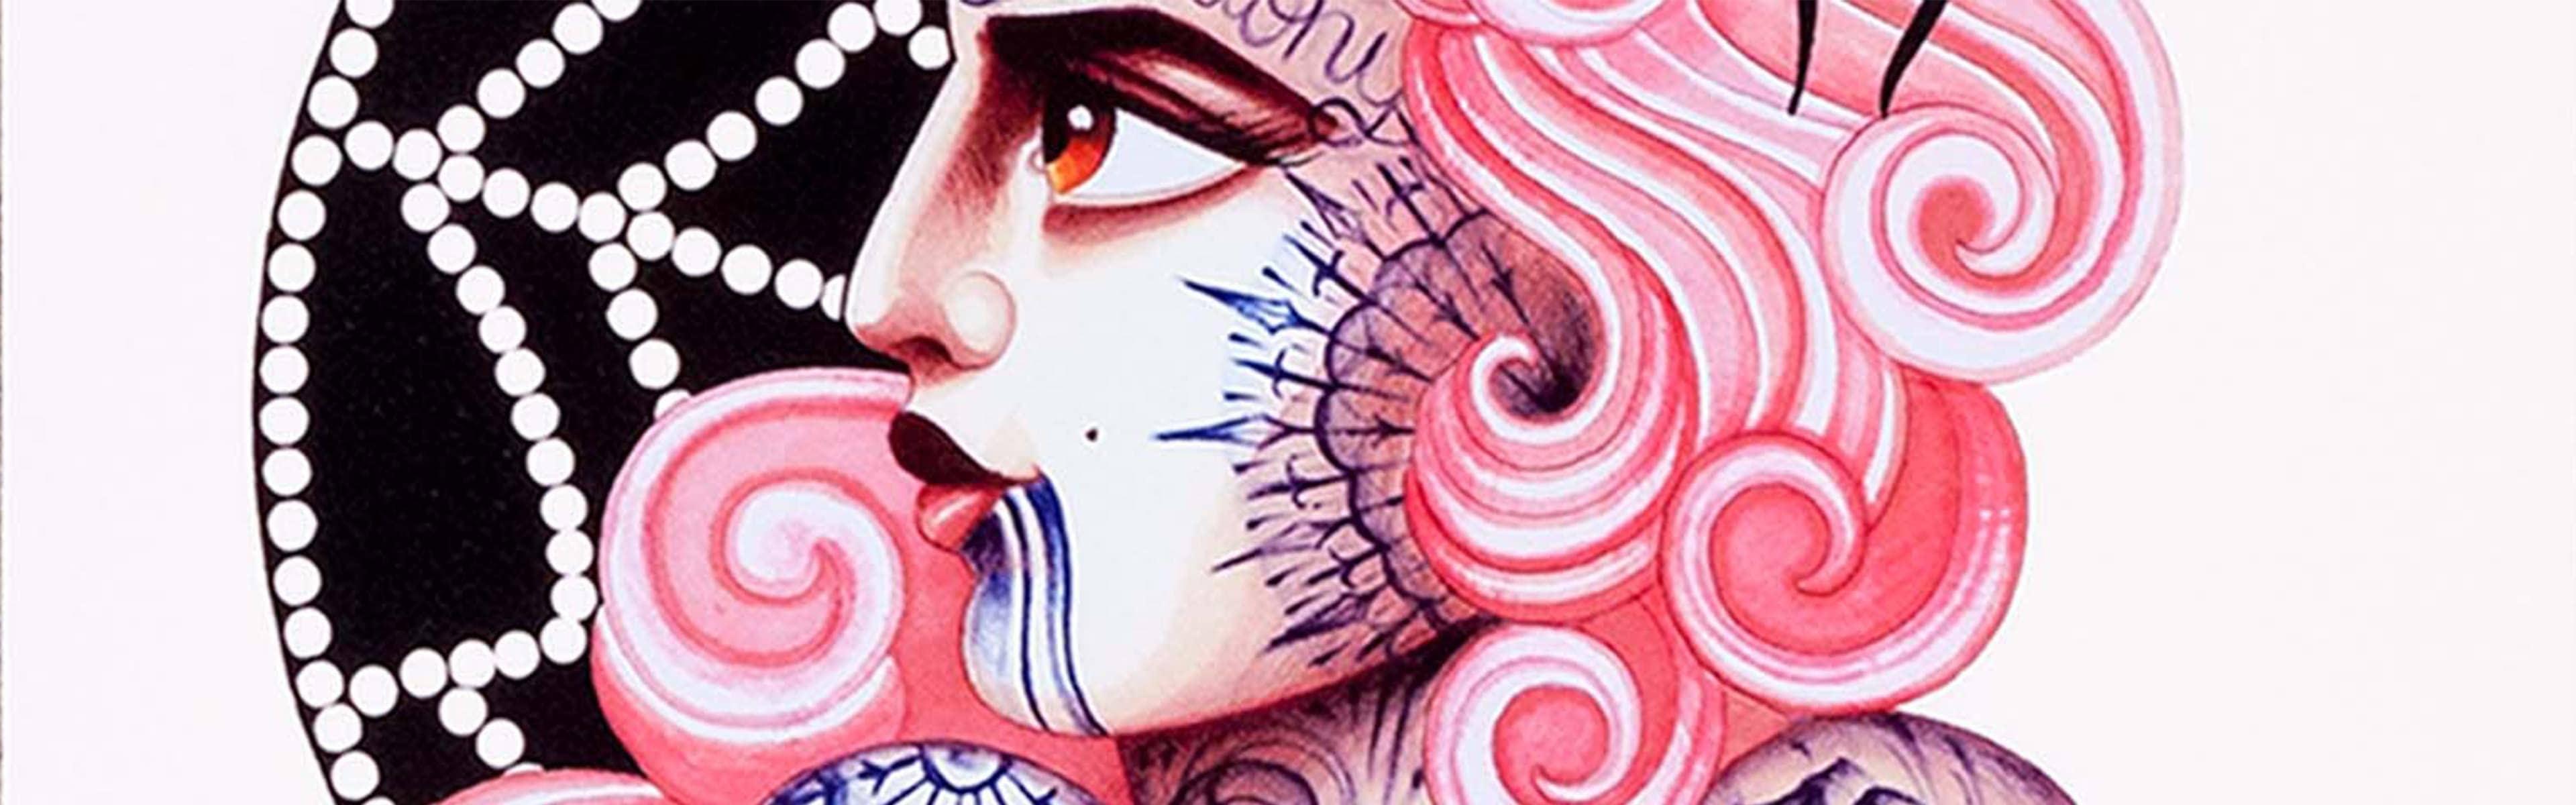 Ramon Maiden and Inma Artwork